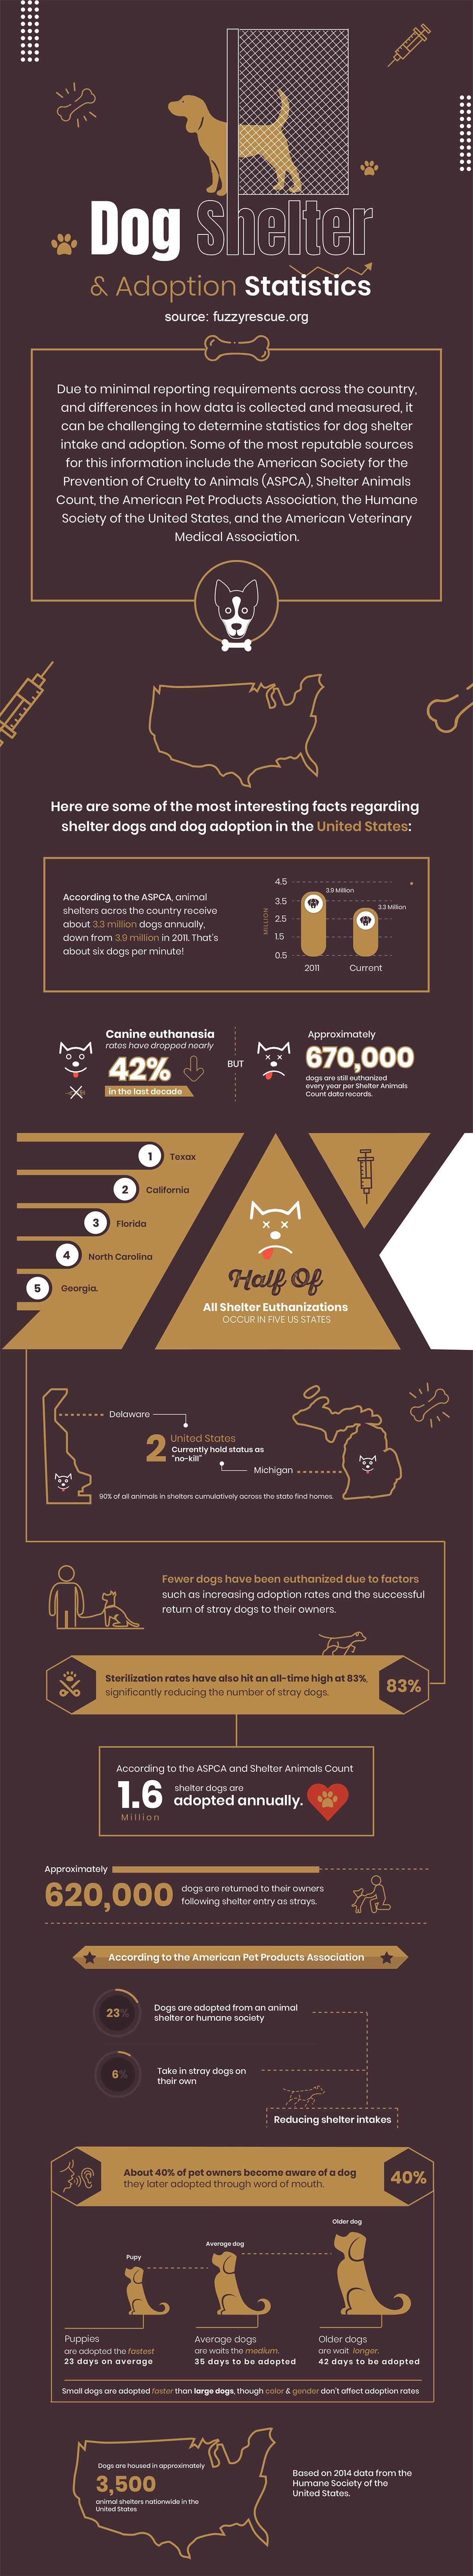 Dog Shelter Infographic 1